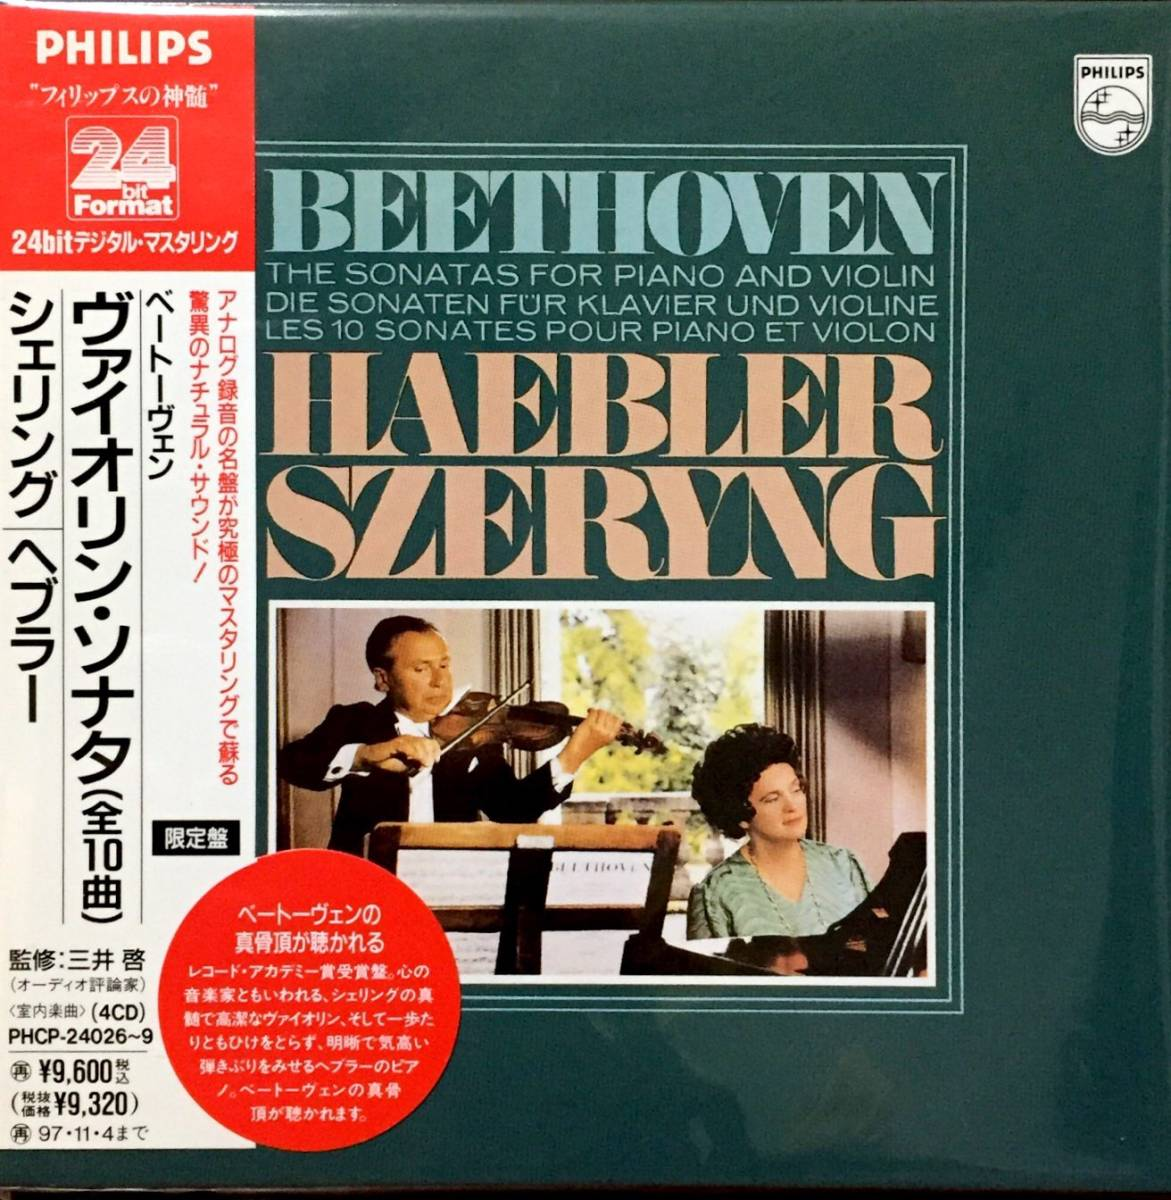 PHILIPS 24bit 紙ジャケ(紙箱) 4CD ベートーヴェン ヴァイオリン・ソナタ全集 シェリング&ヘブラー